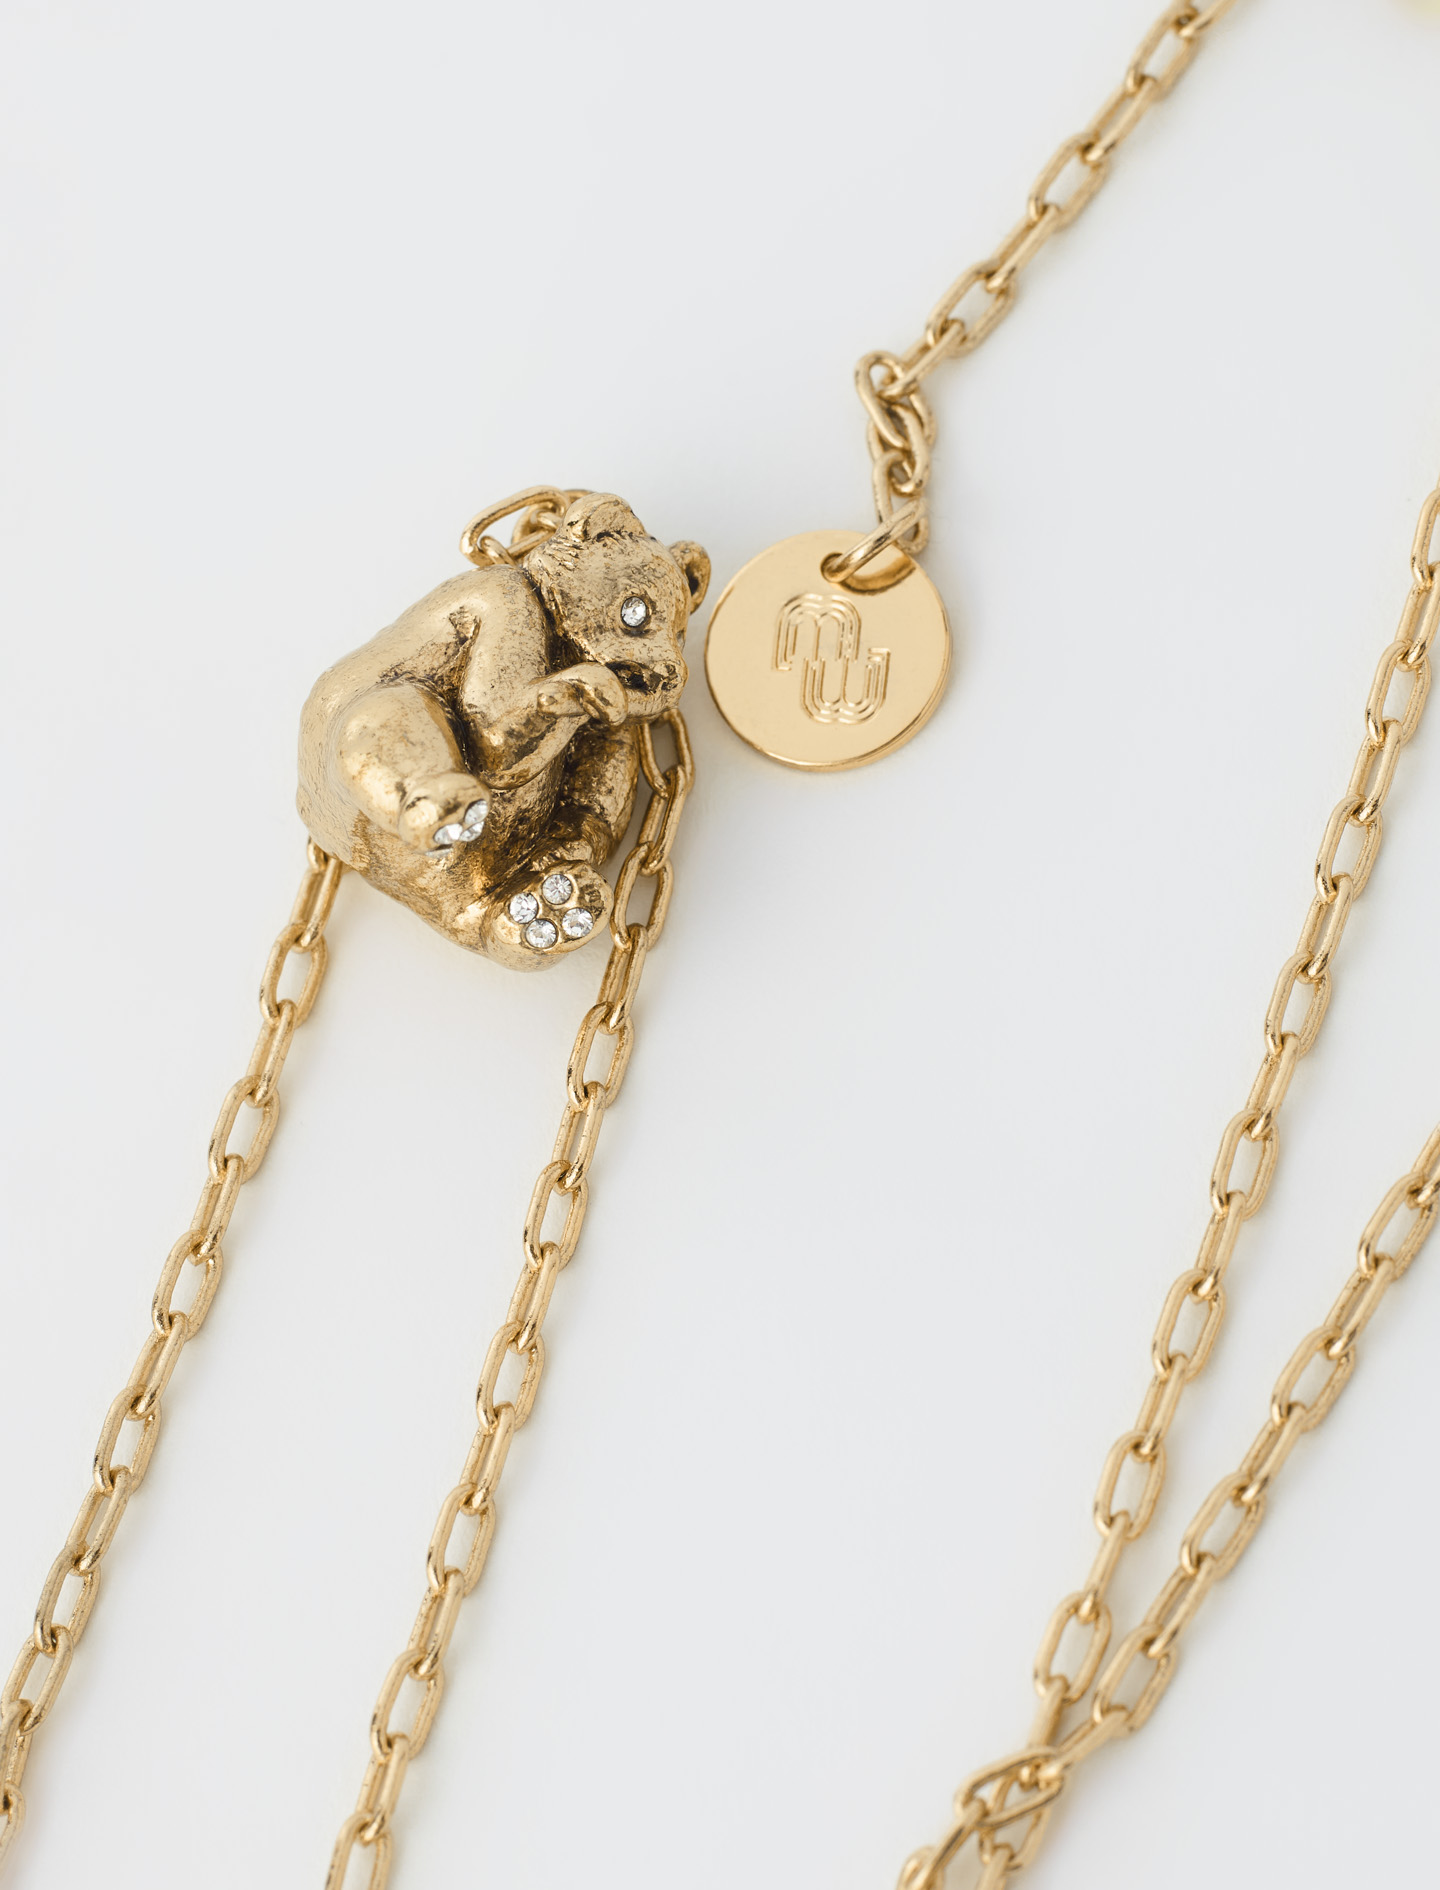 Maje Panda animal necklace